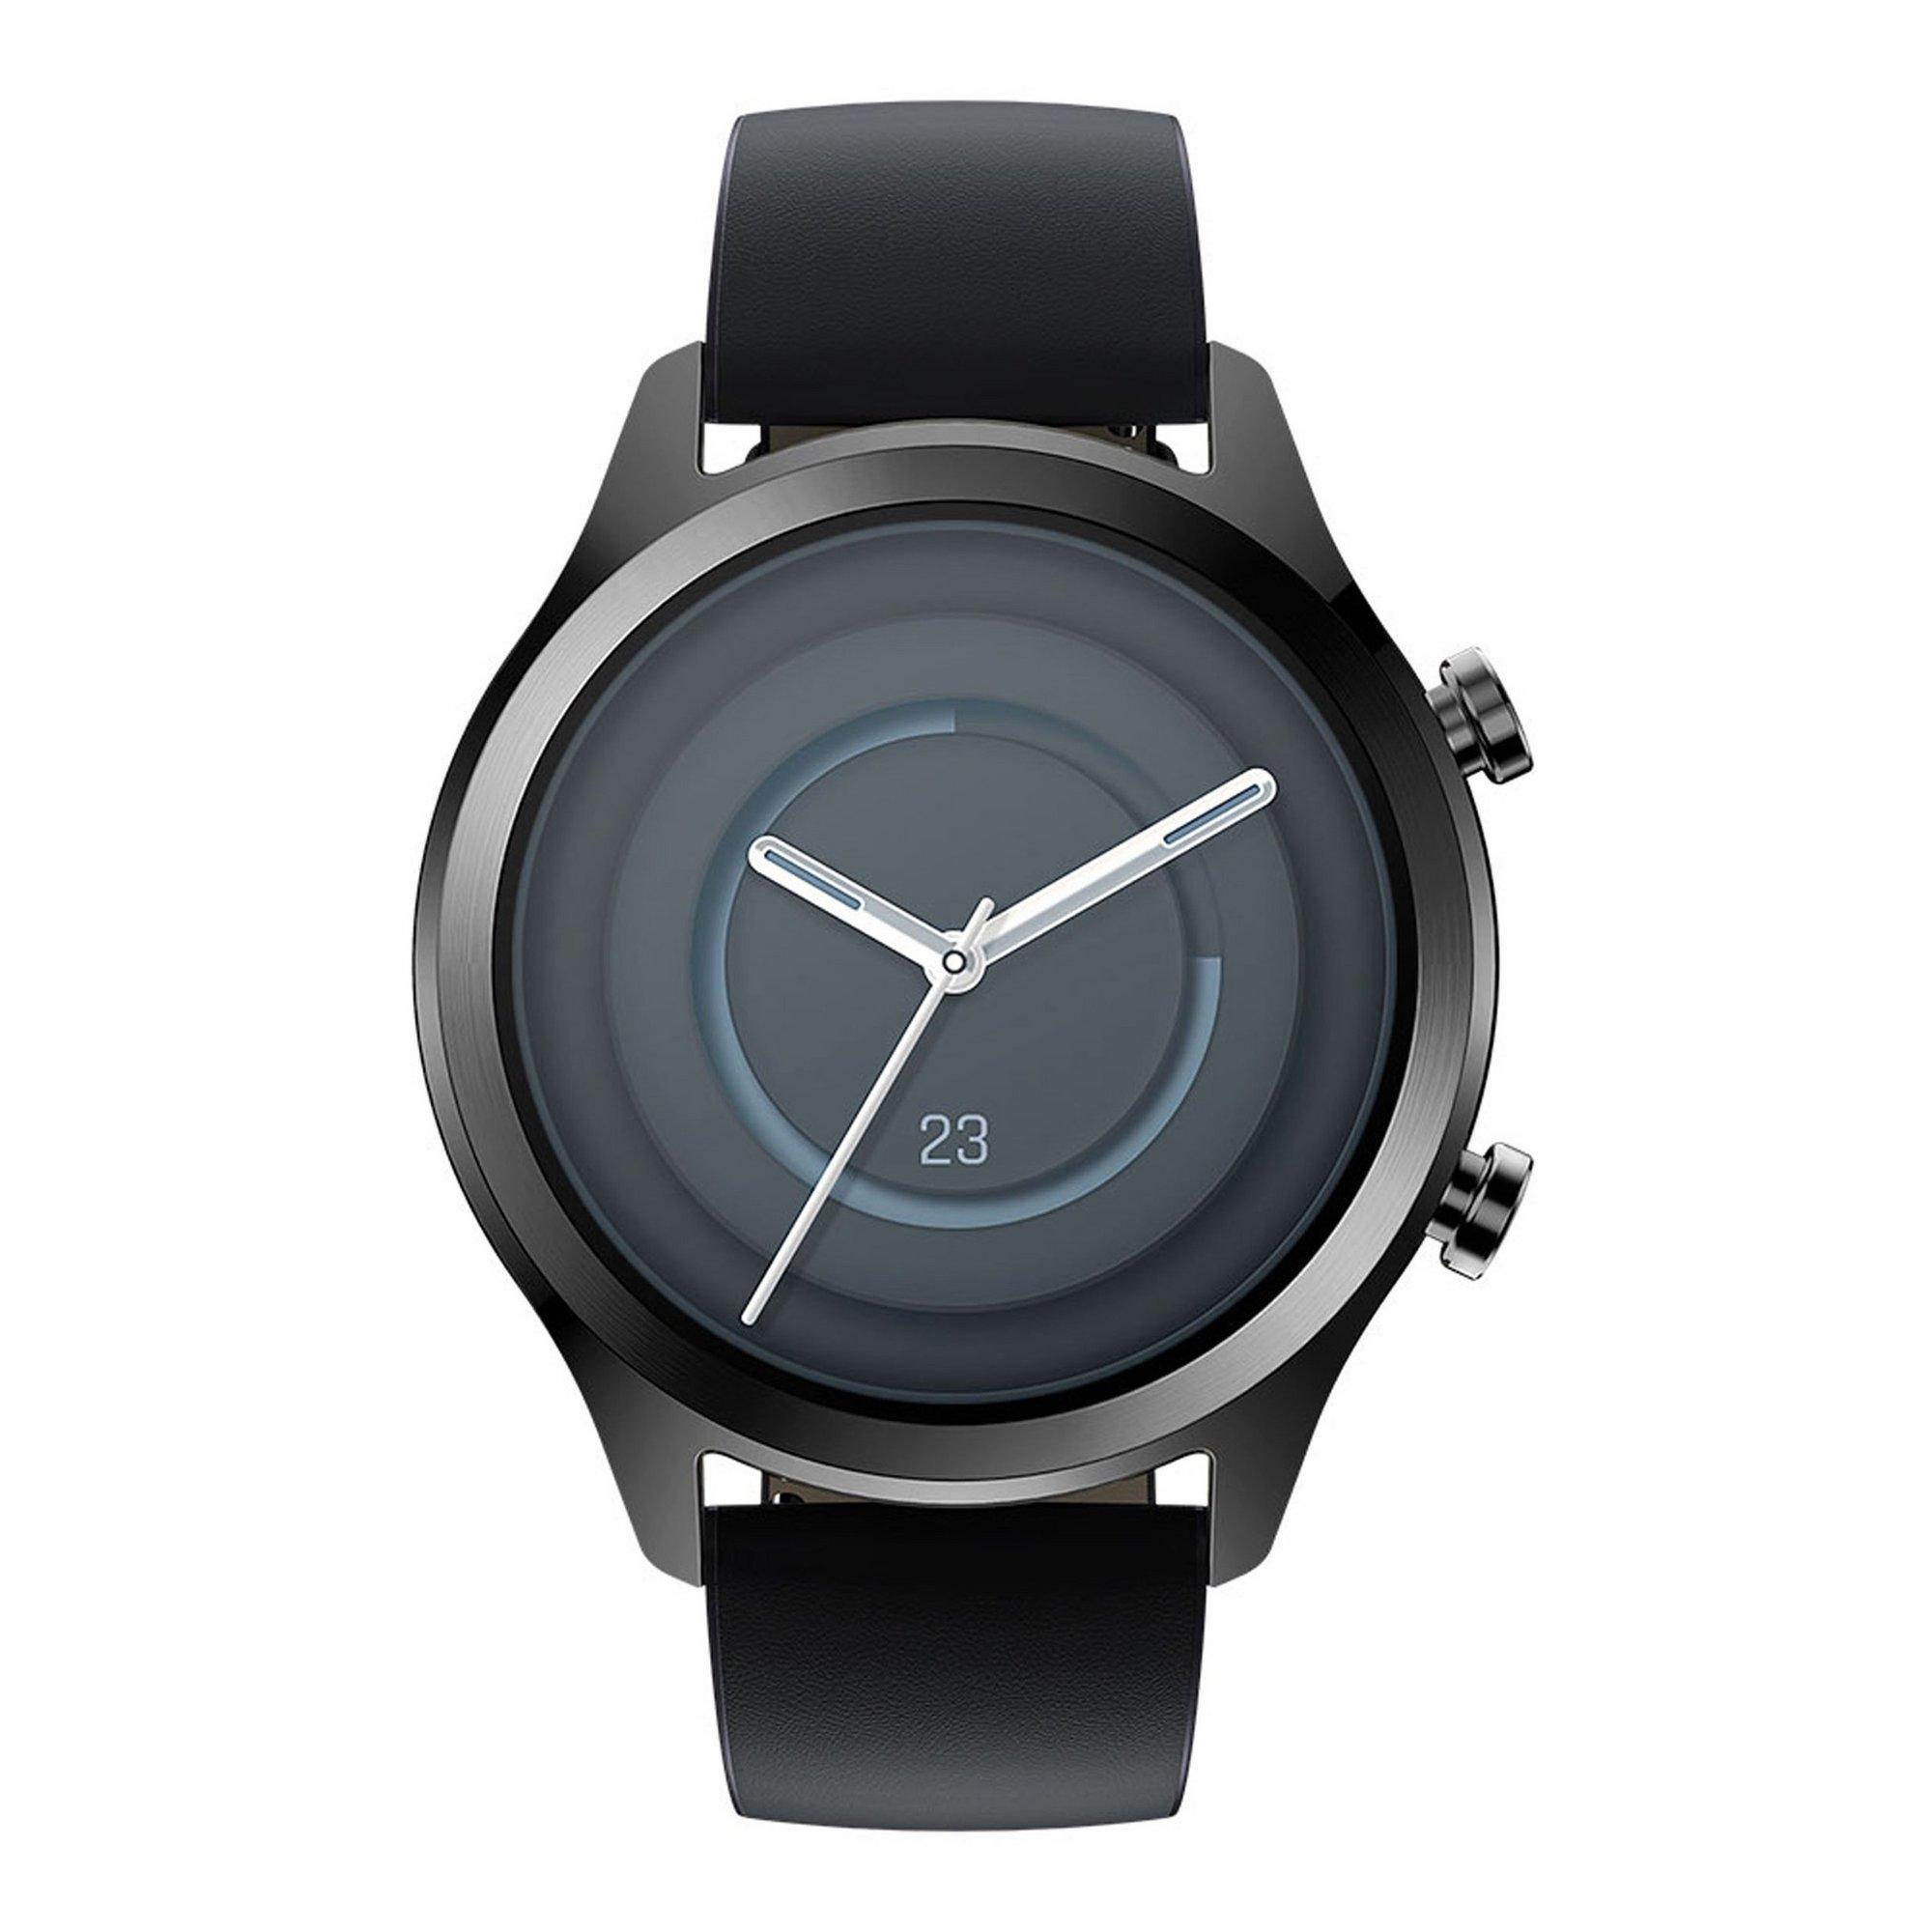 Image of TicWatch C2+ 1GB RAM Smartwatch